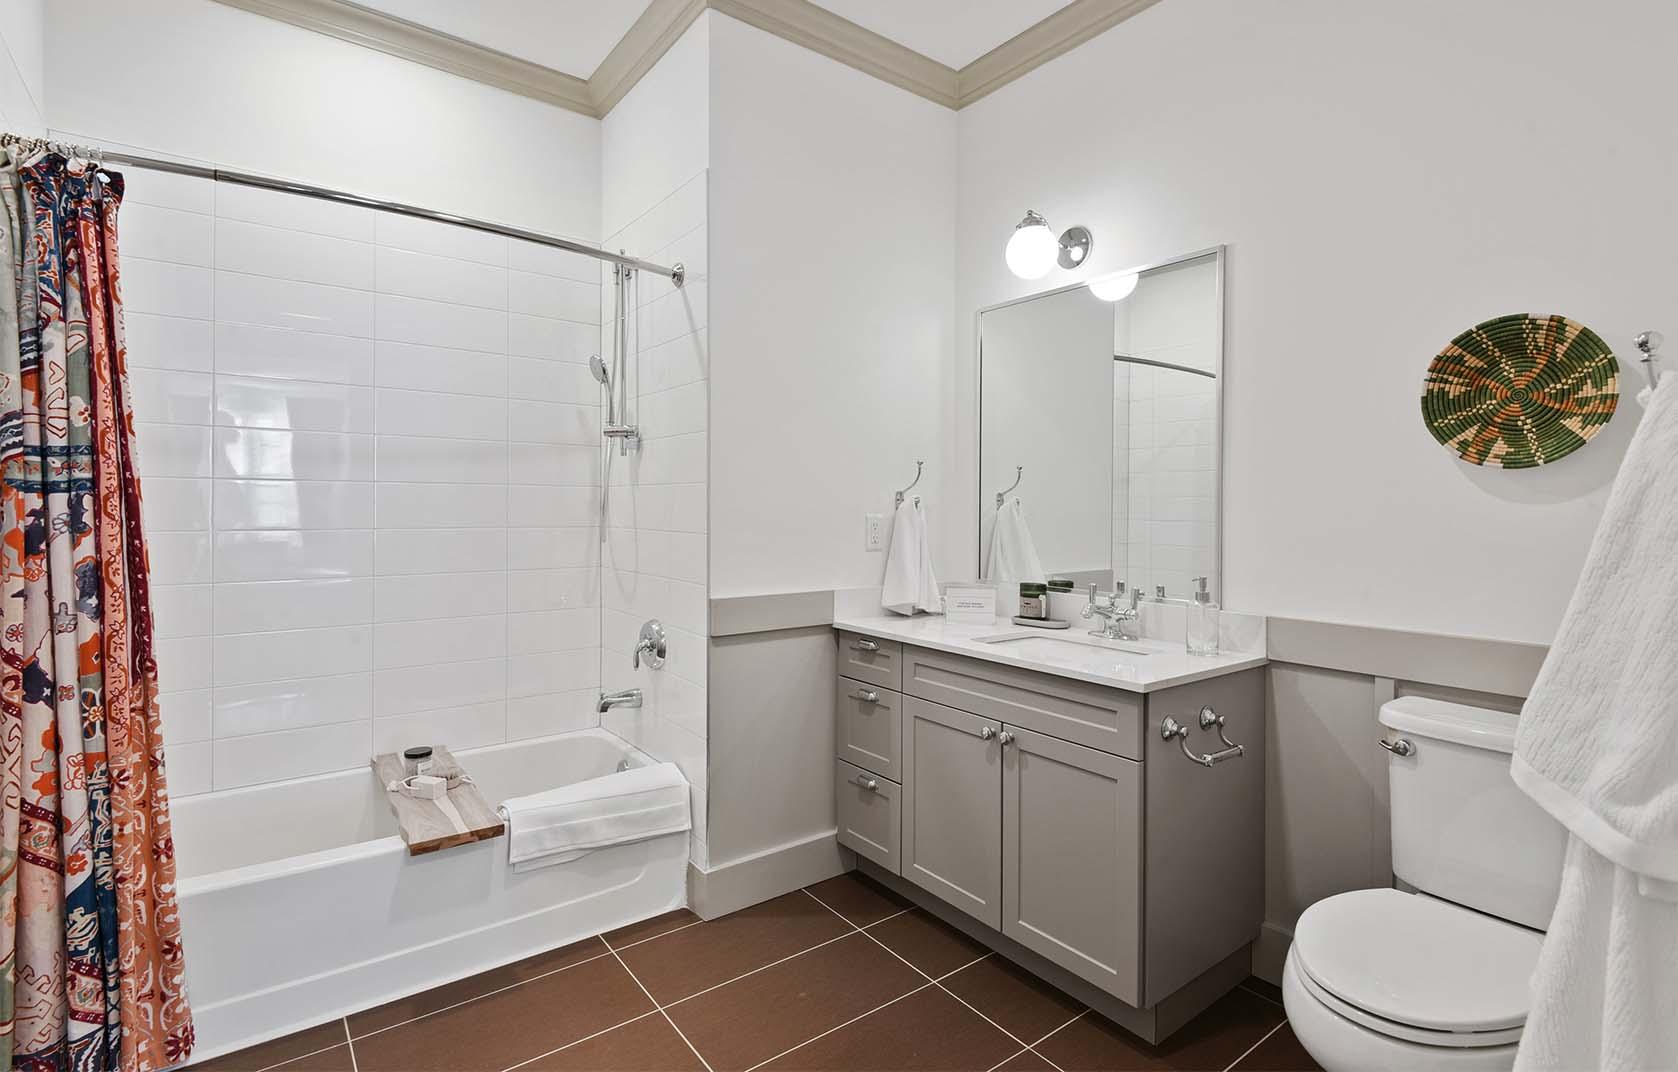 Luxury bathroom with elegant decor and beautiful fixtures.